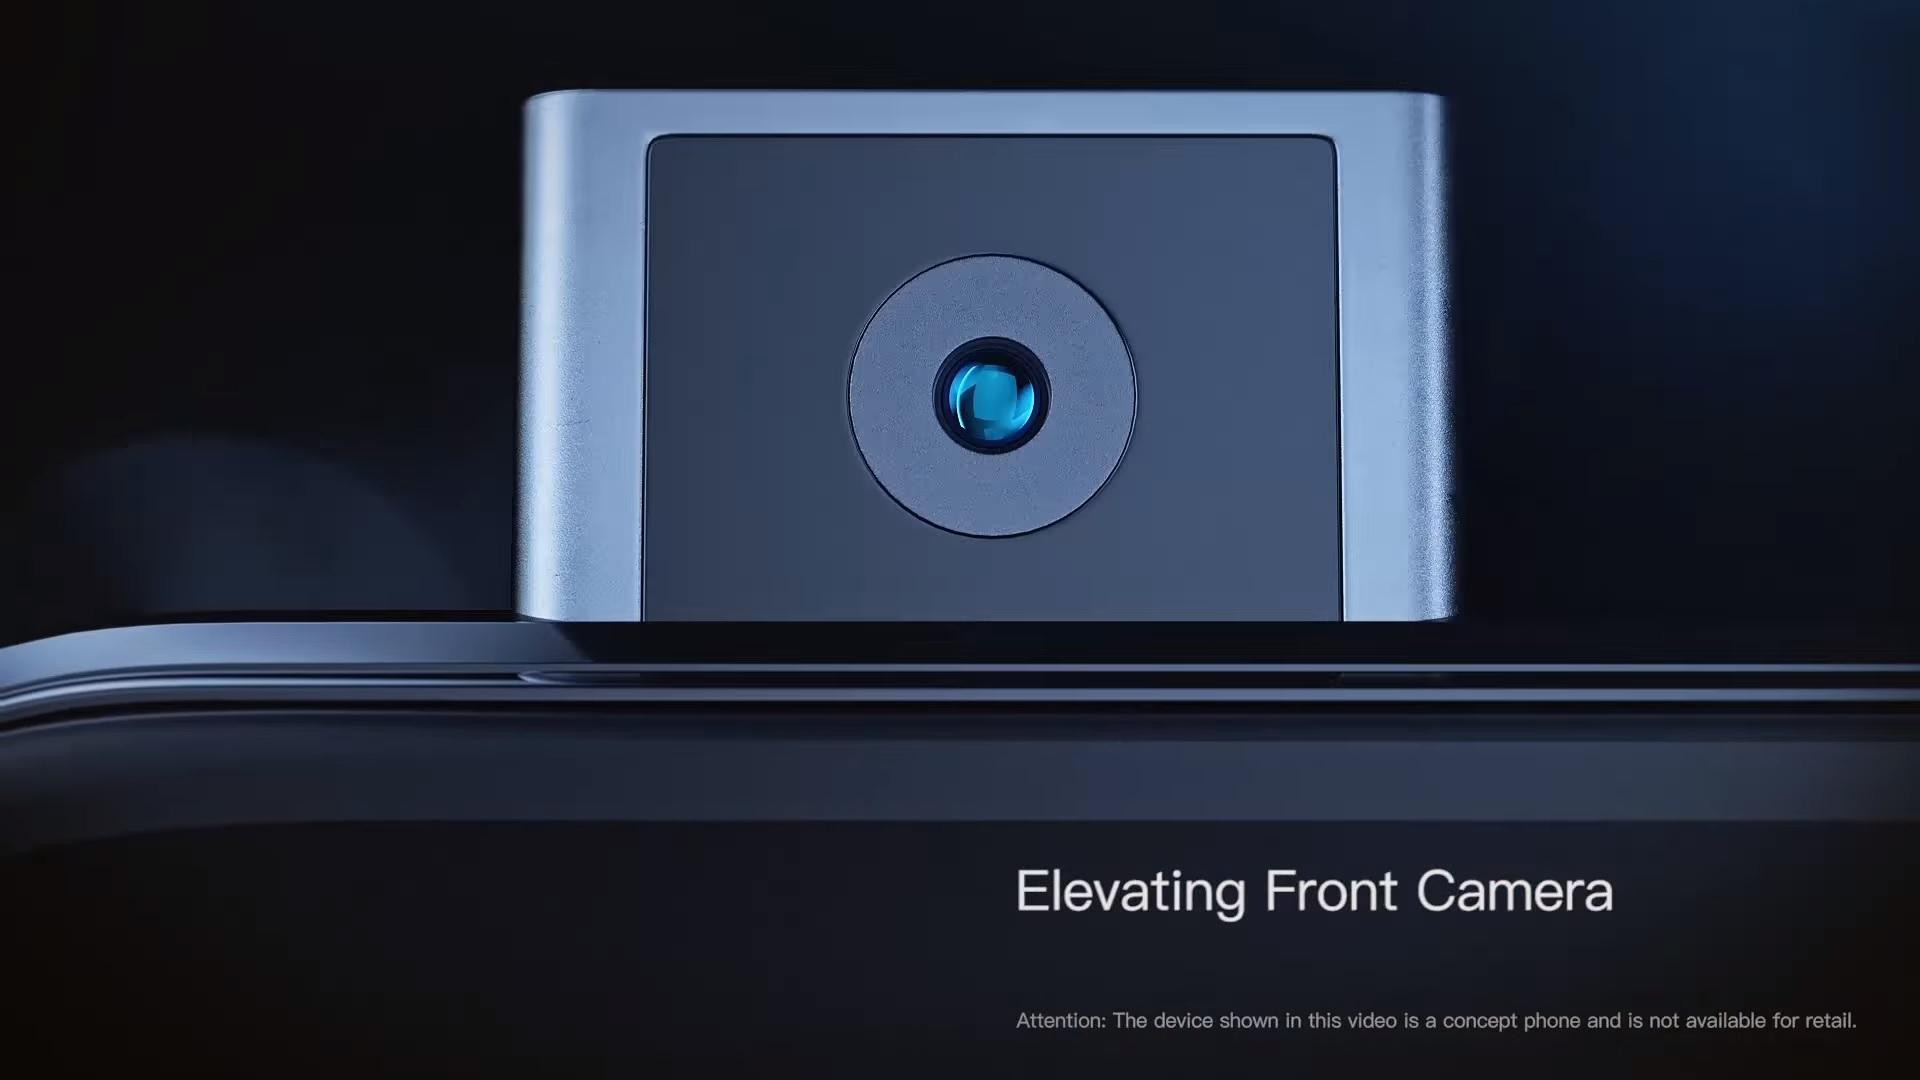 vivo apex le t l phone sans bord et avec un capteur d 39 empreintes sous l 39 cran va tre pr sent. Black Bedroom Furniture Sets. Home Design Ideas